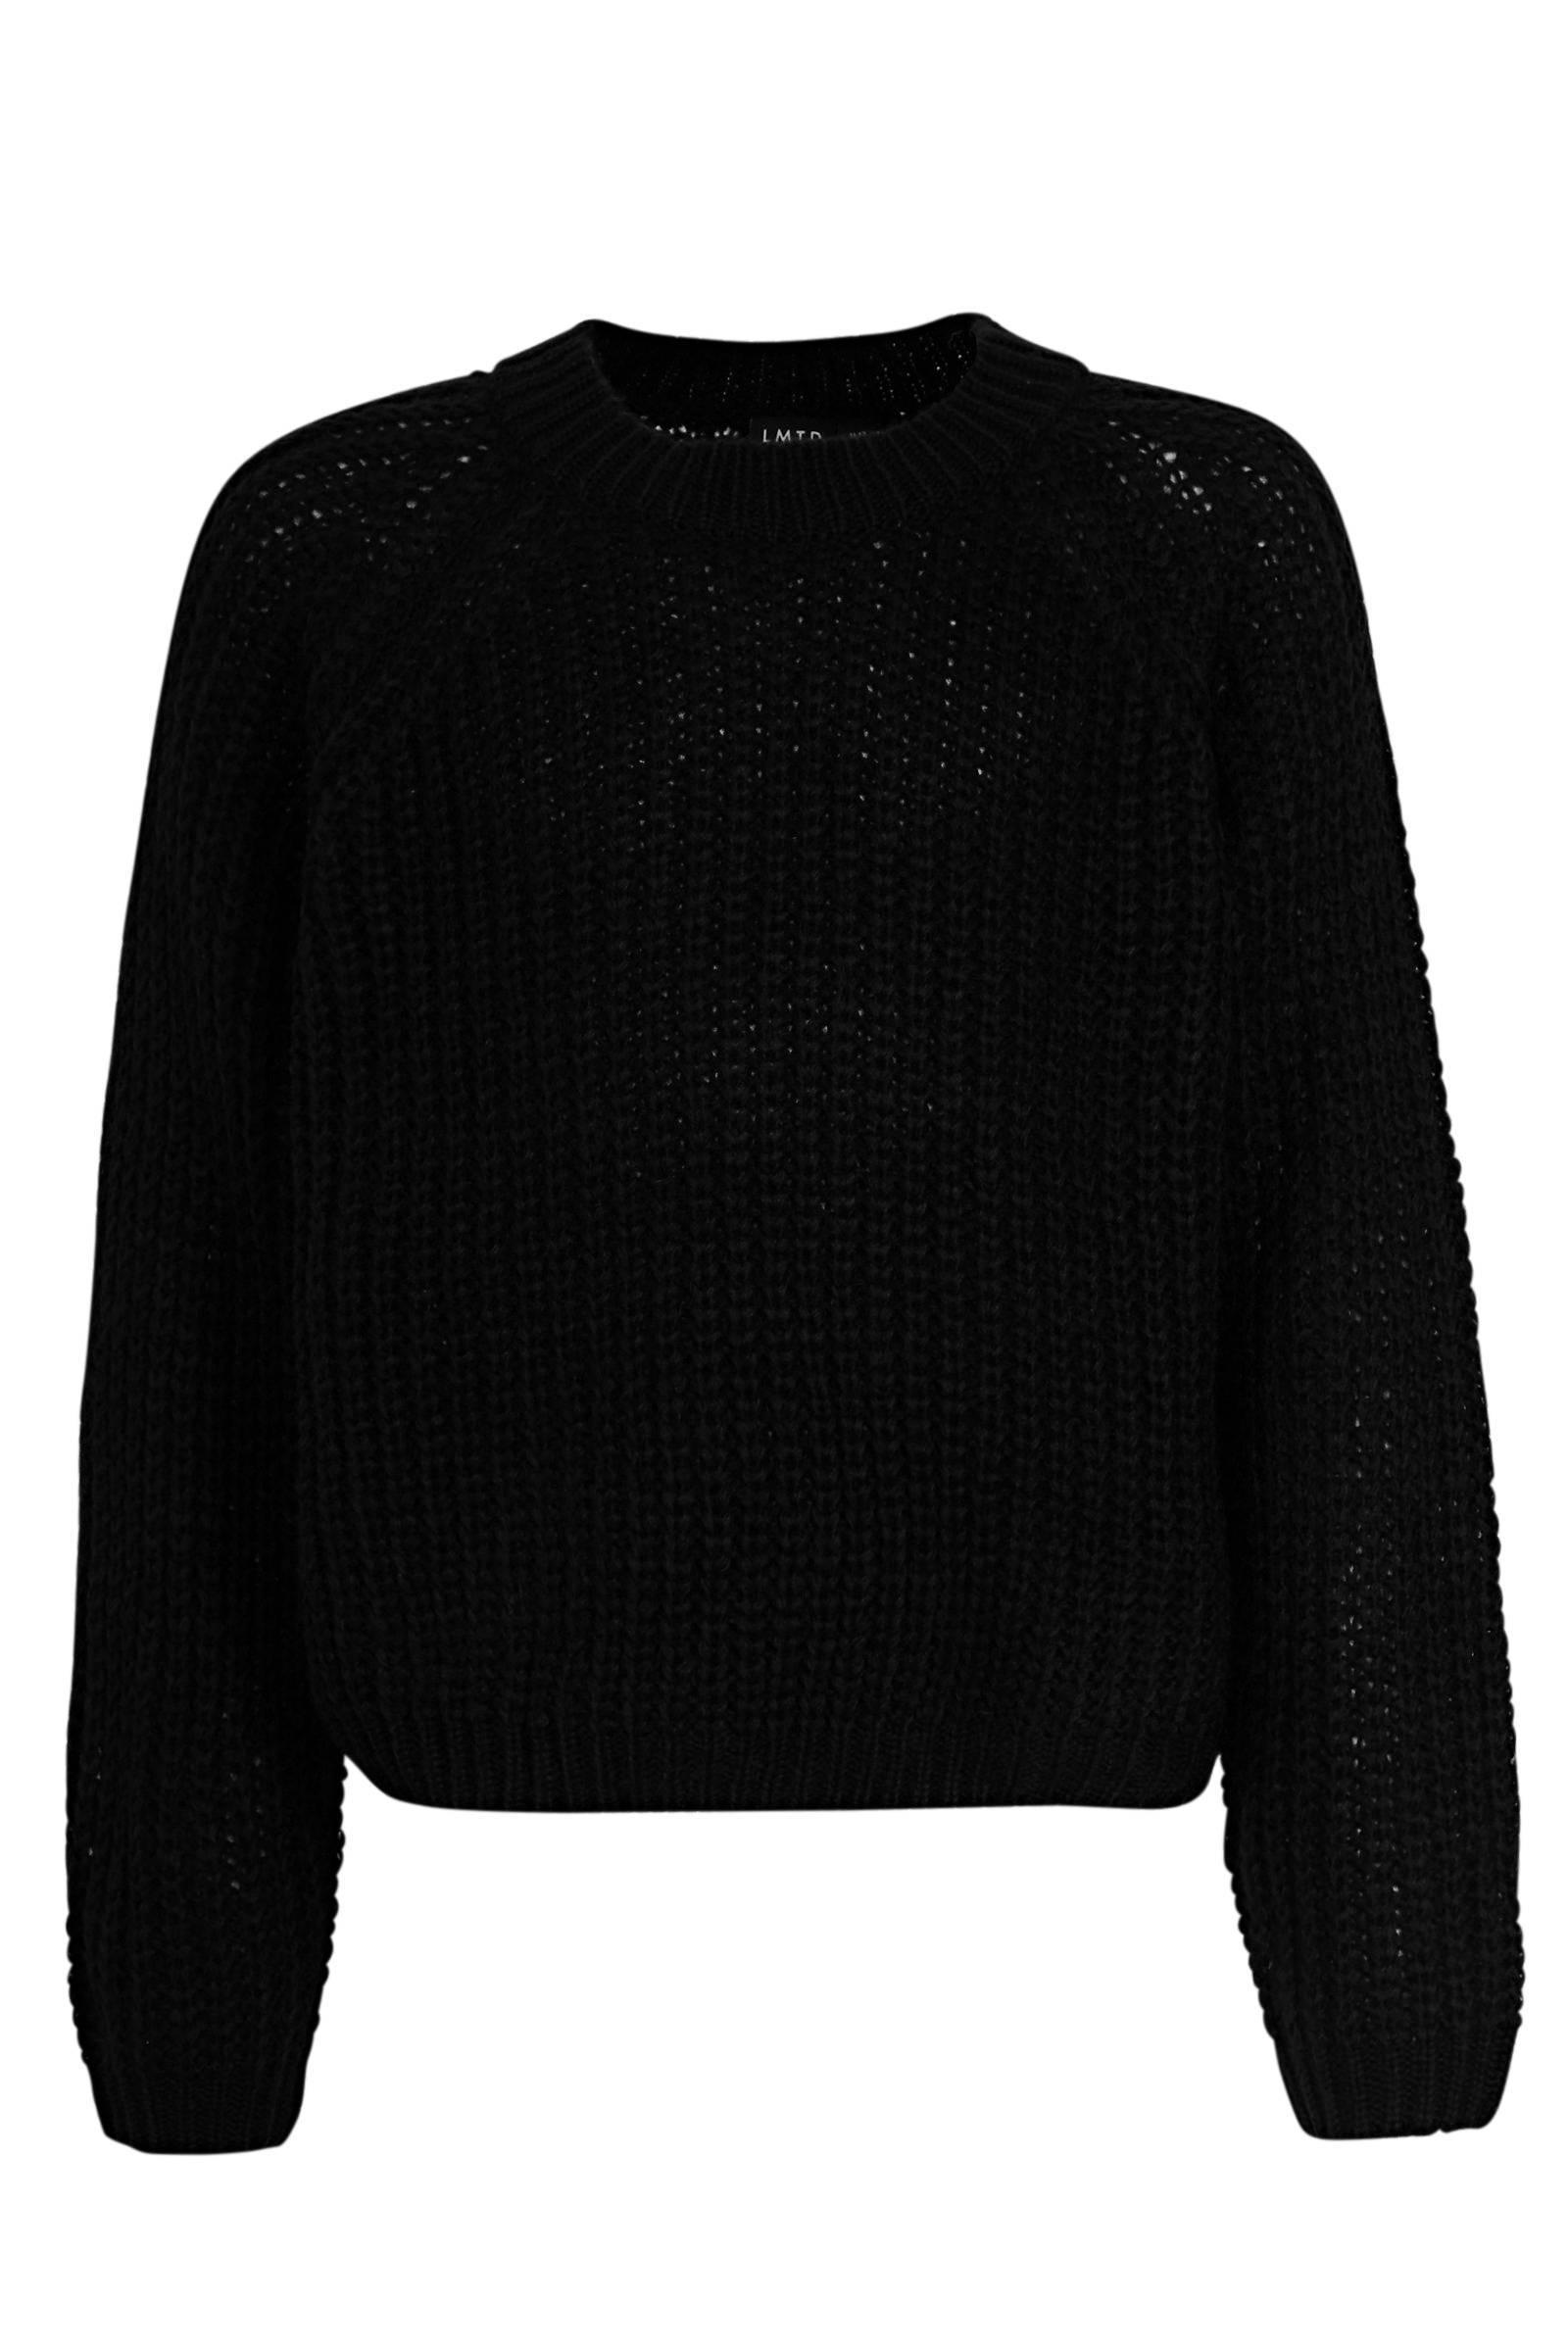 LMTD trui geelwitzwart | wehkamp